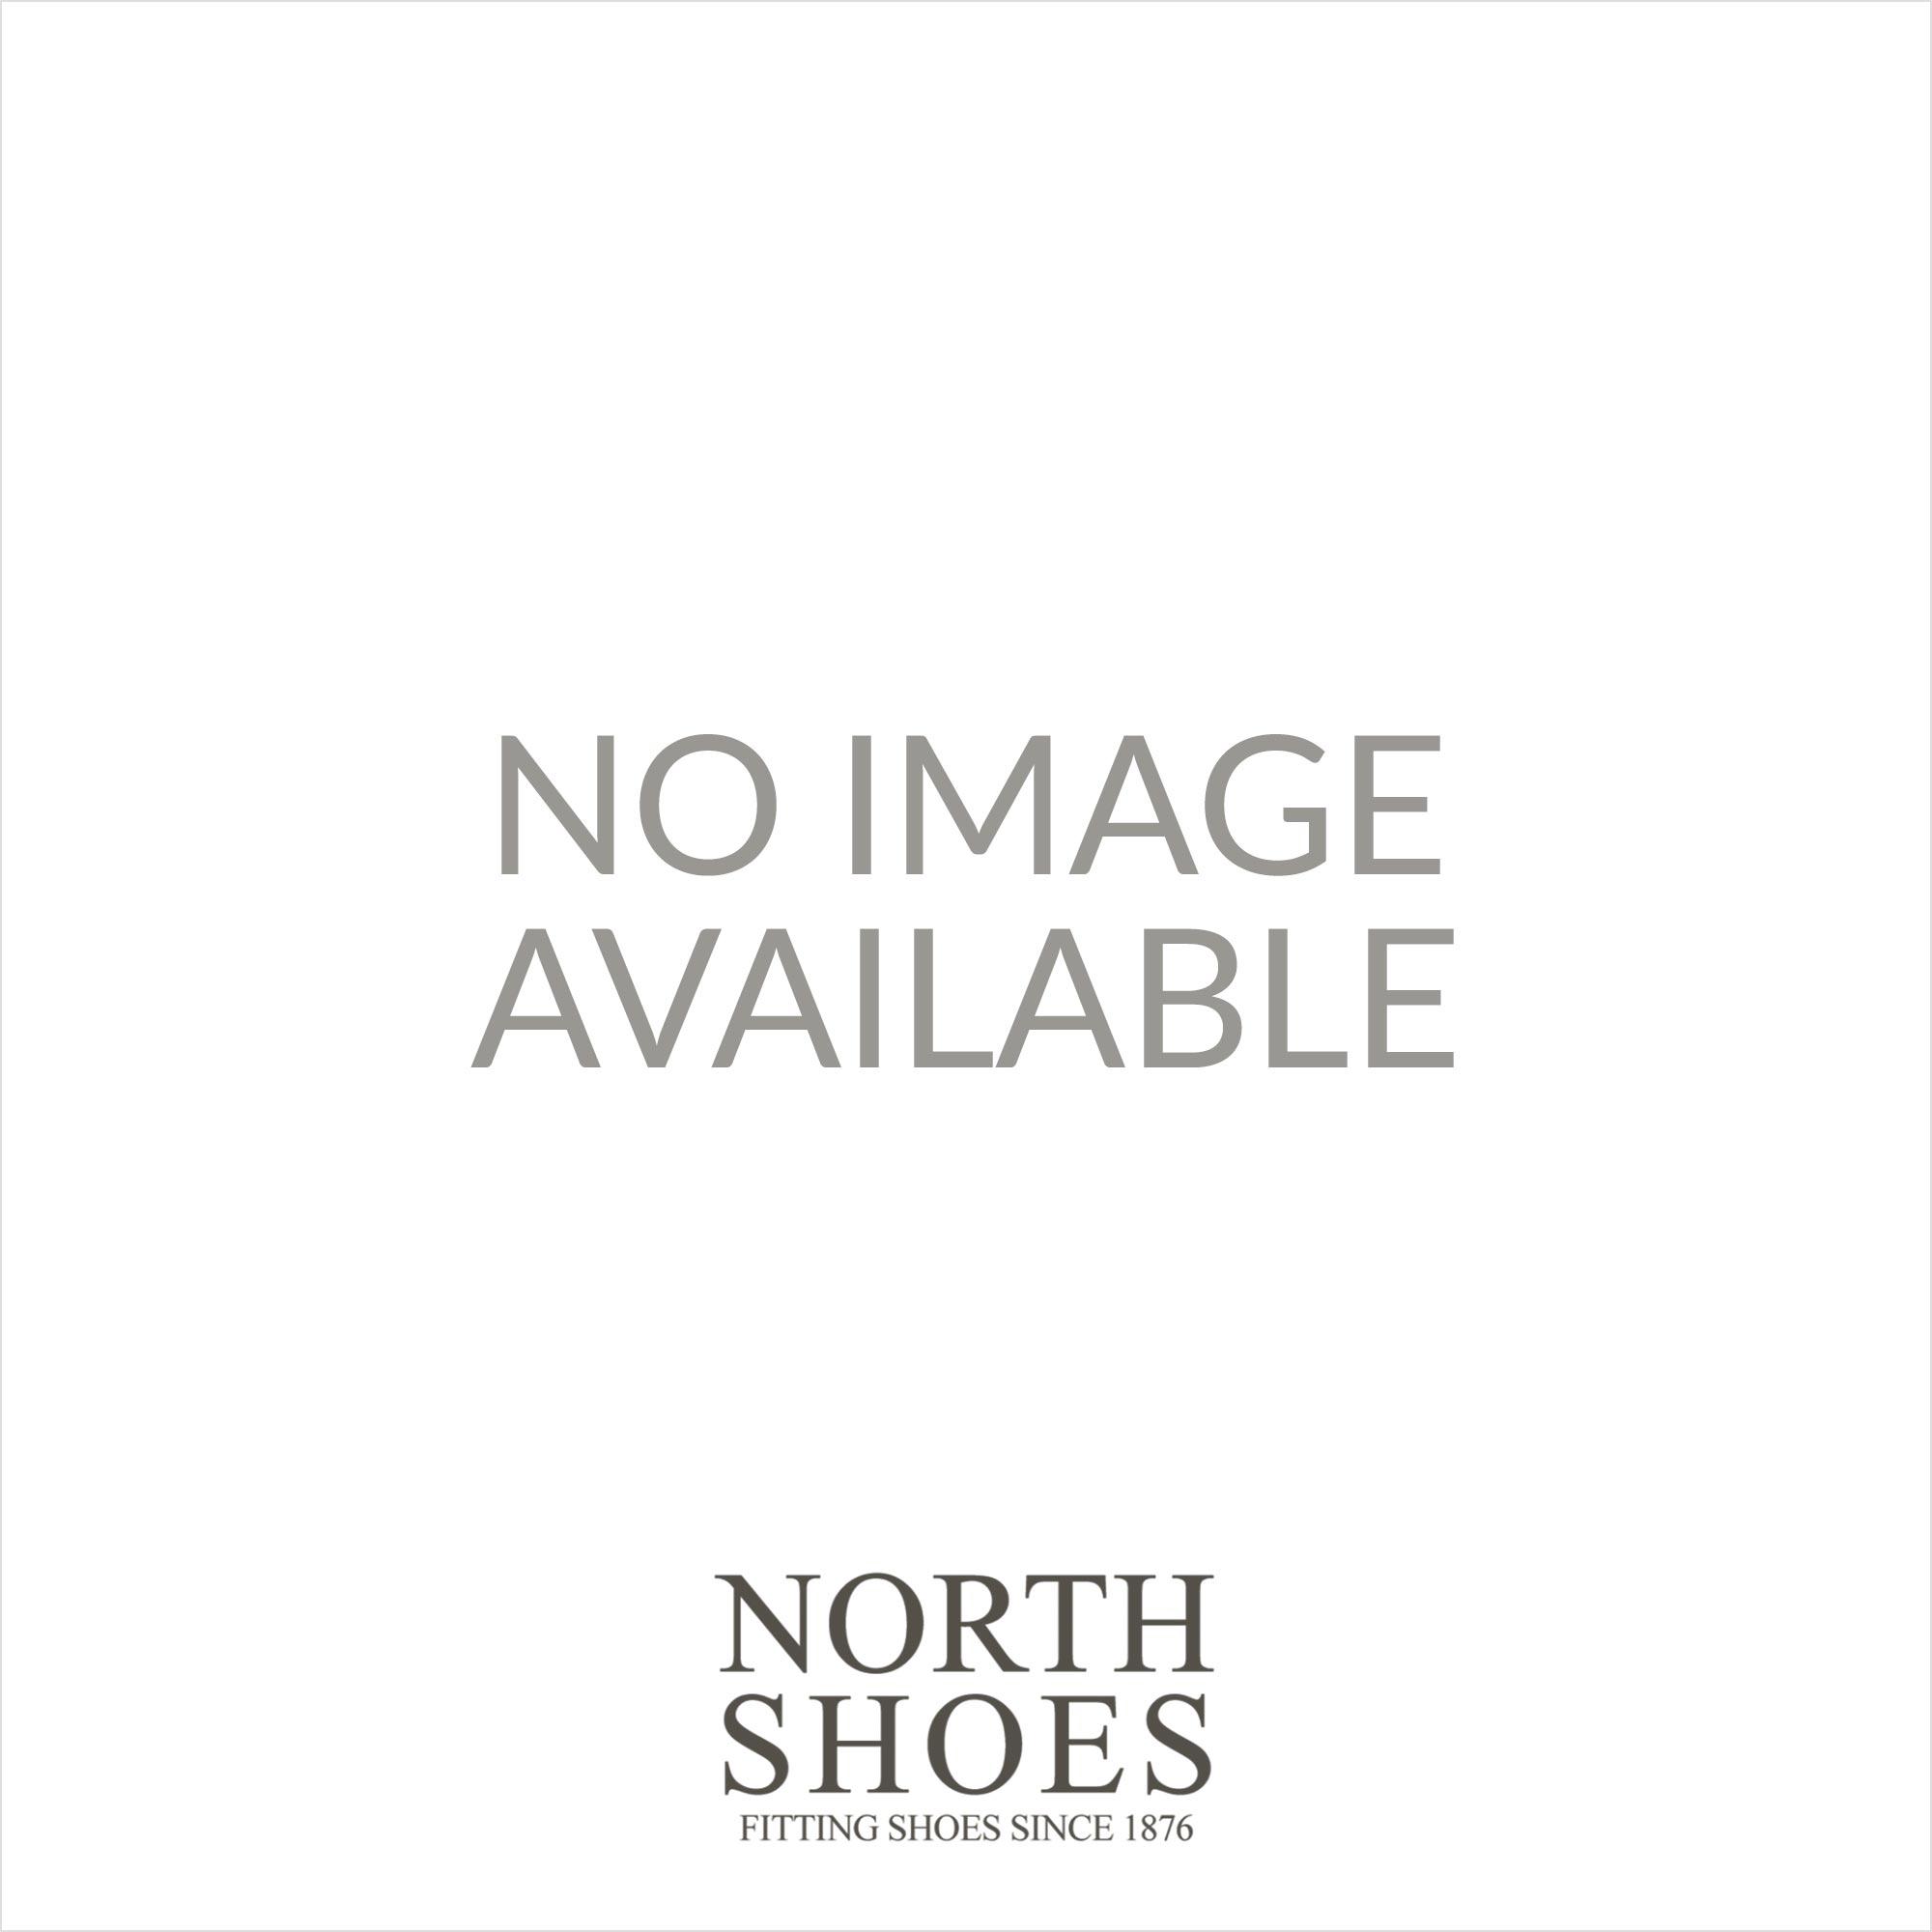 9d2c02612ec ... Clarks Preppy Edge Black Leather Girls Slip On Loafer School Shoes ...